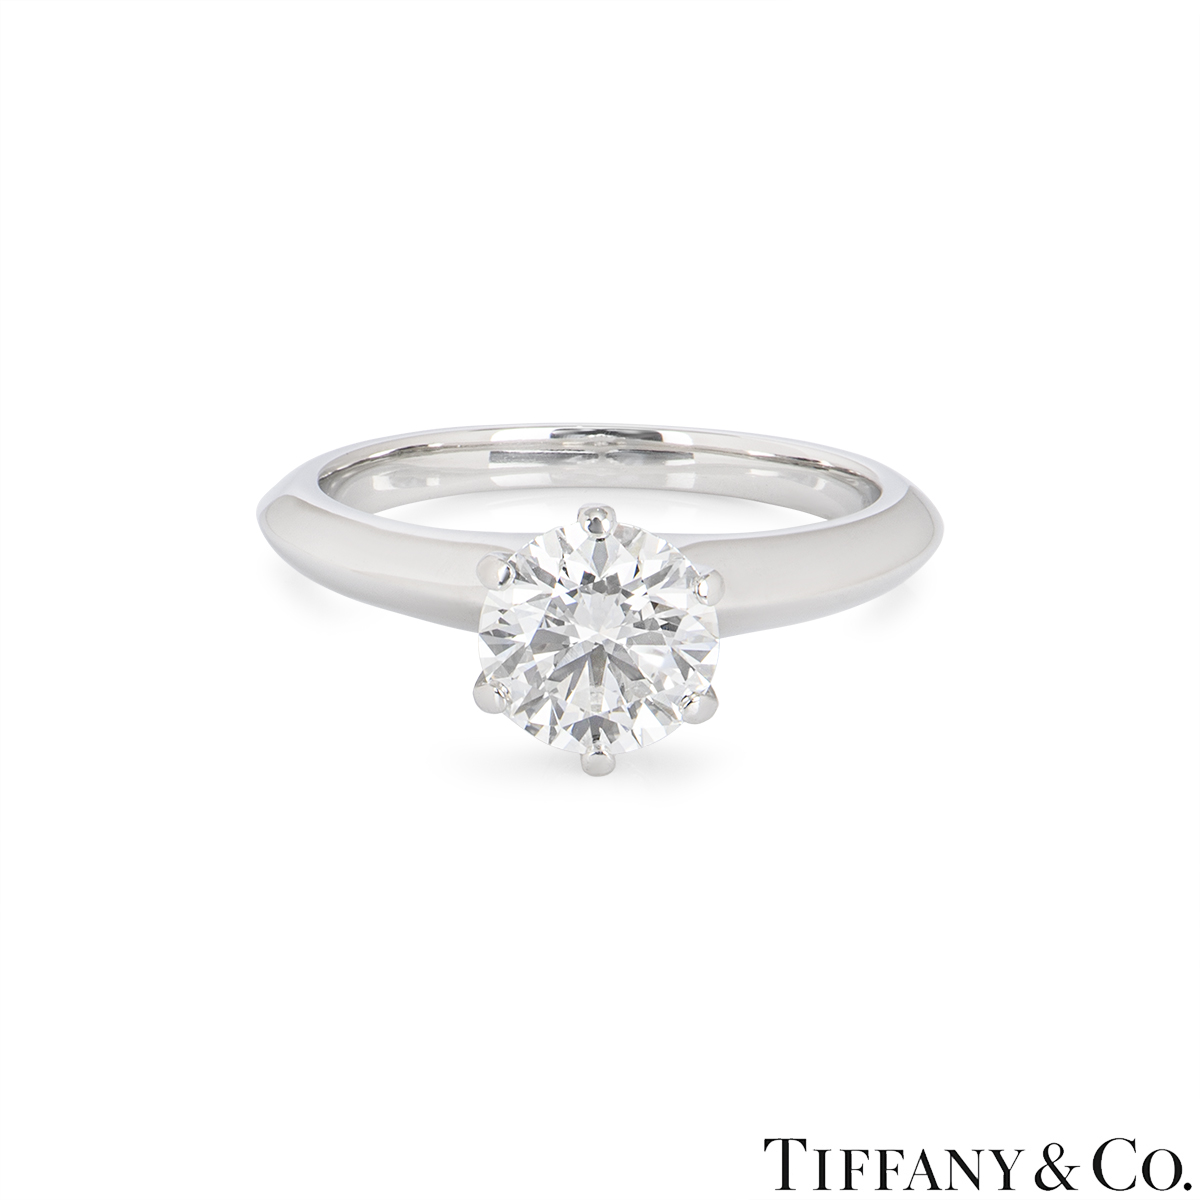 Tiffany & Co. Platinum Diamond Setting Ring 1.21ct I/SI1 XXX